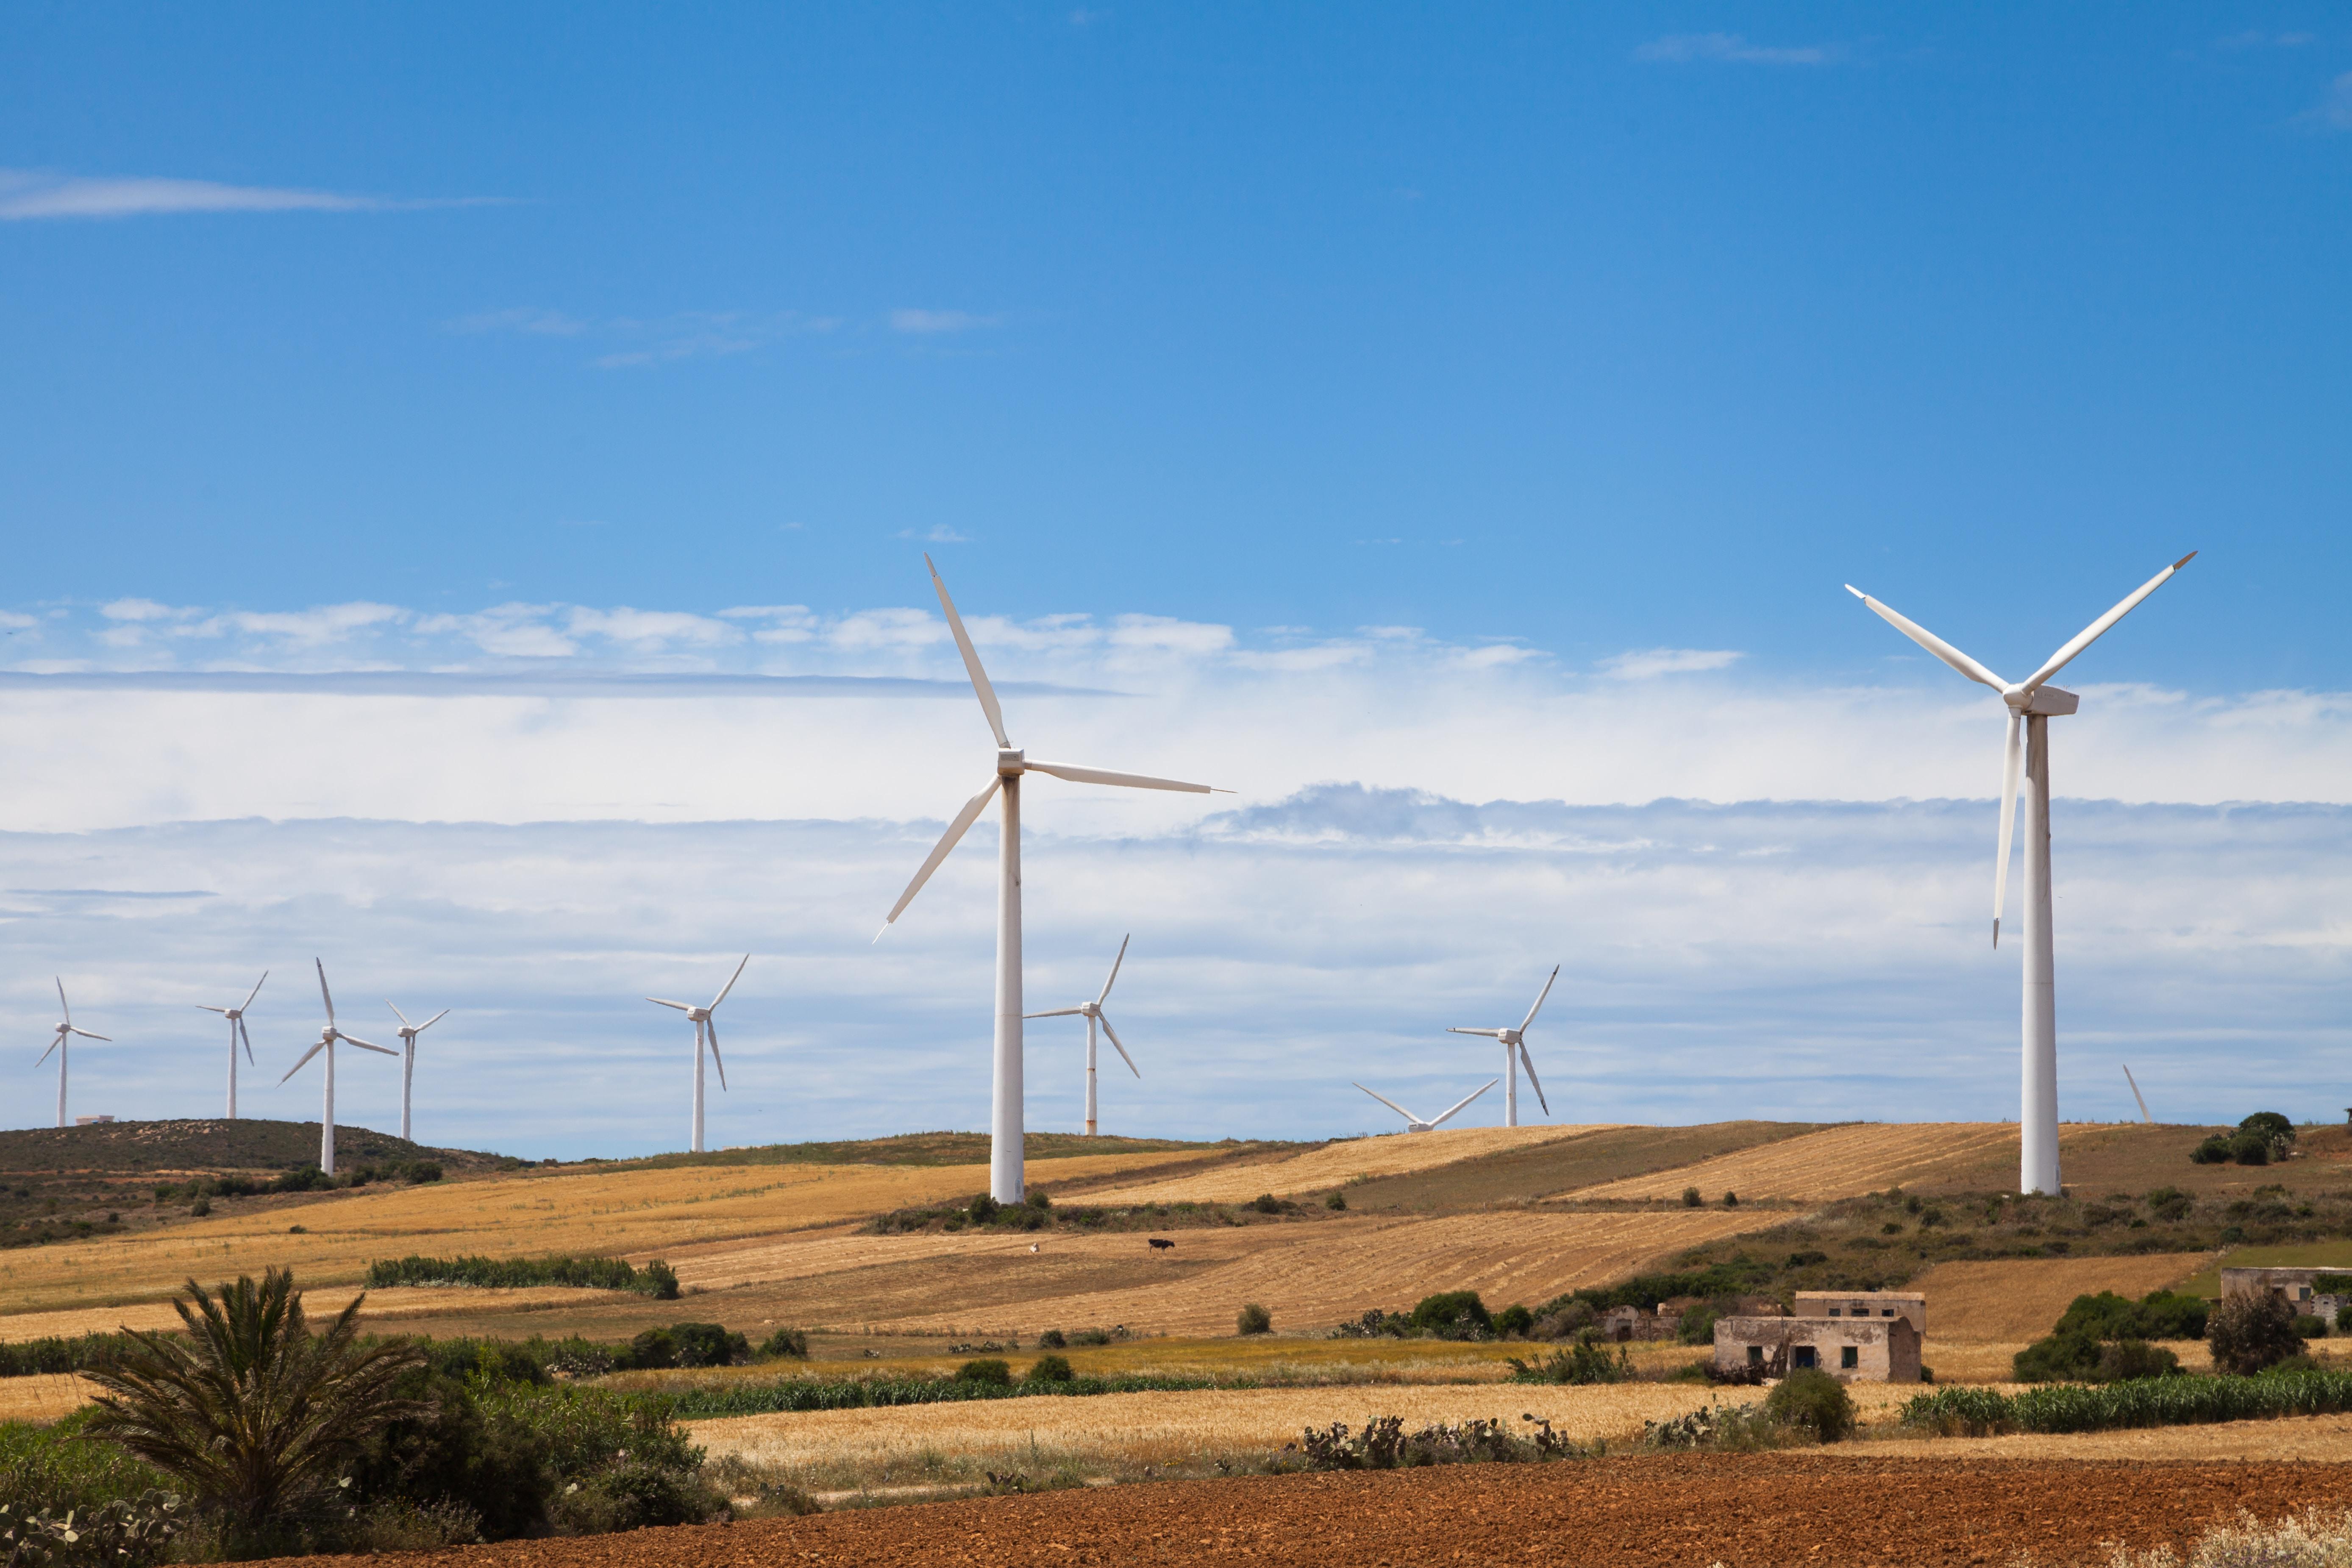 white windmills under blue sky during daytime